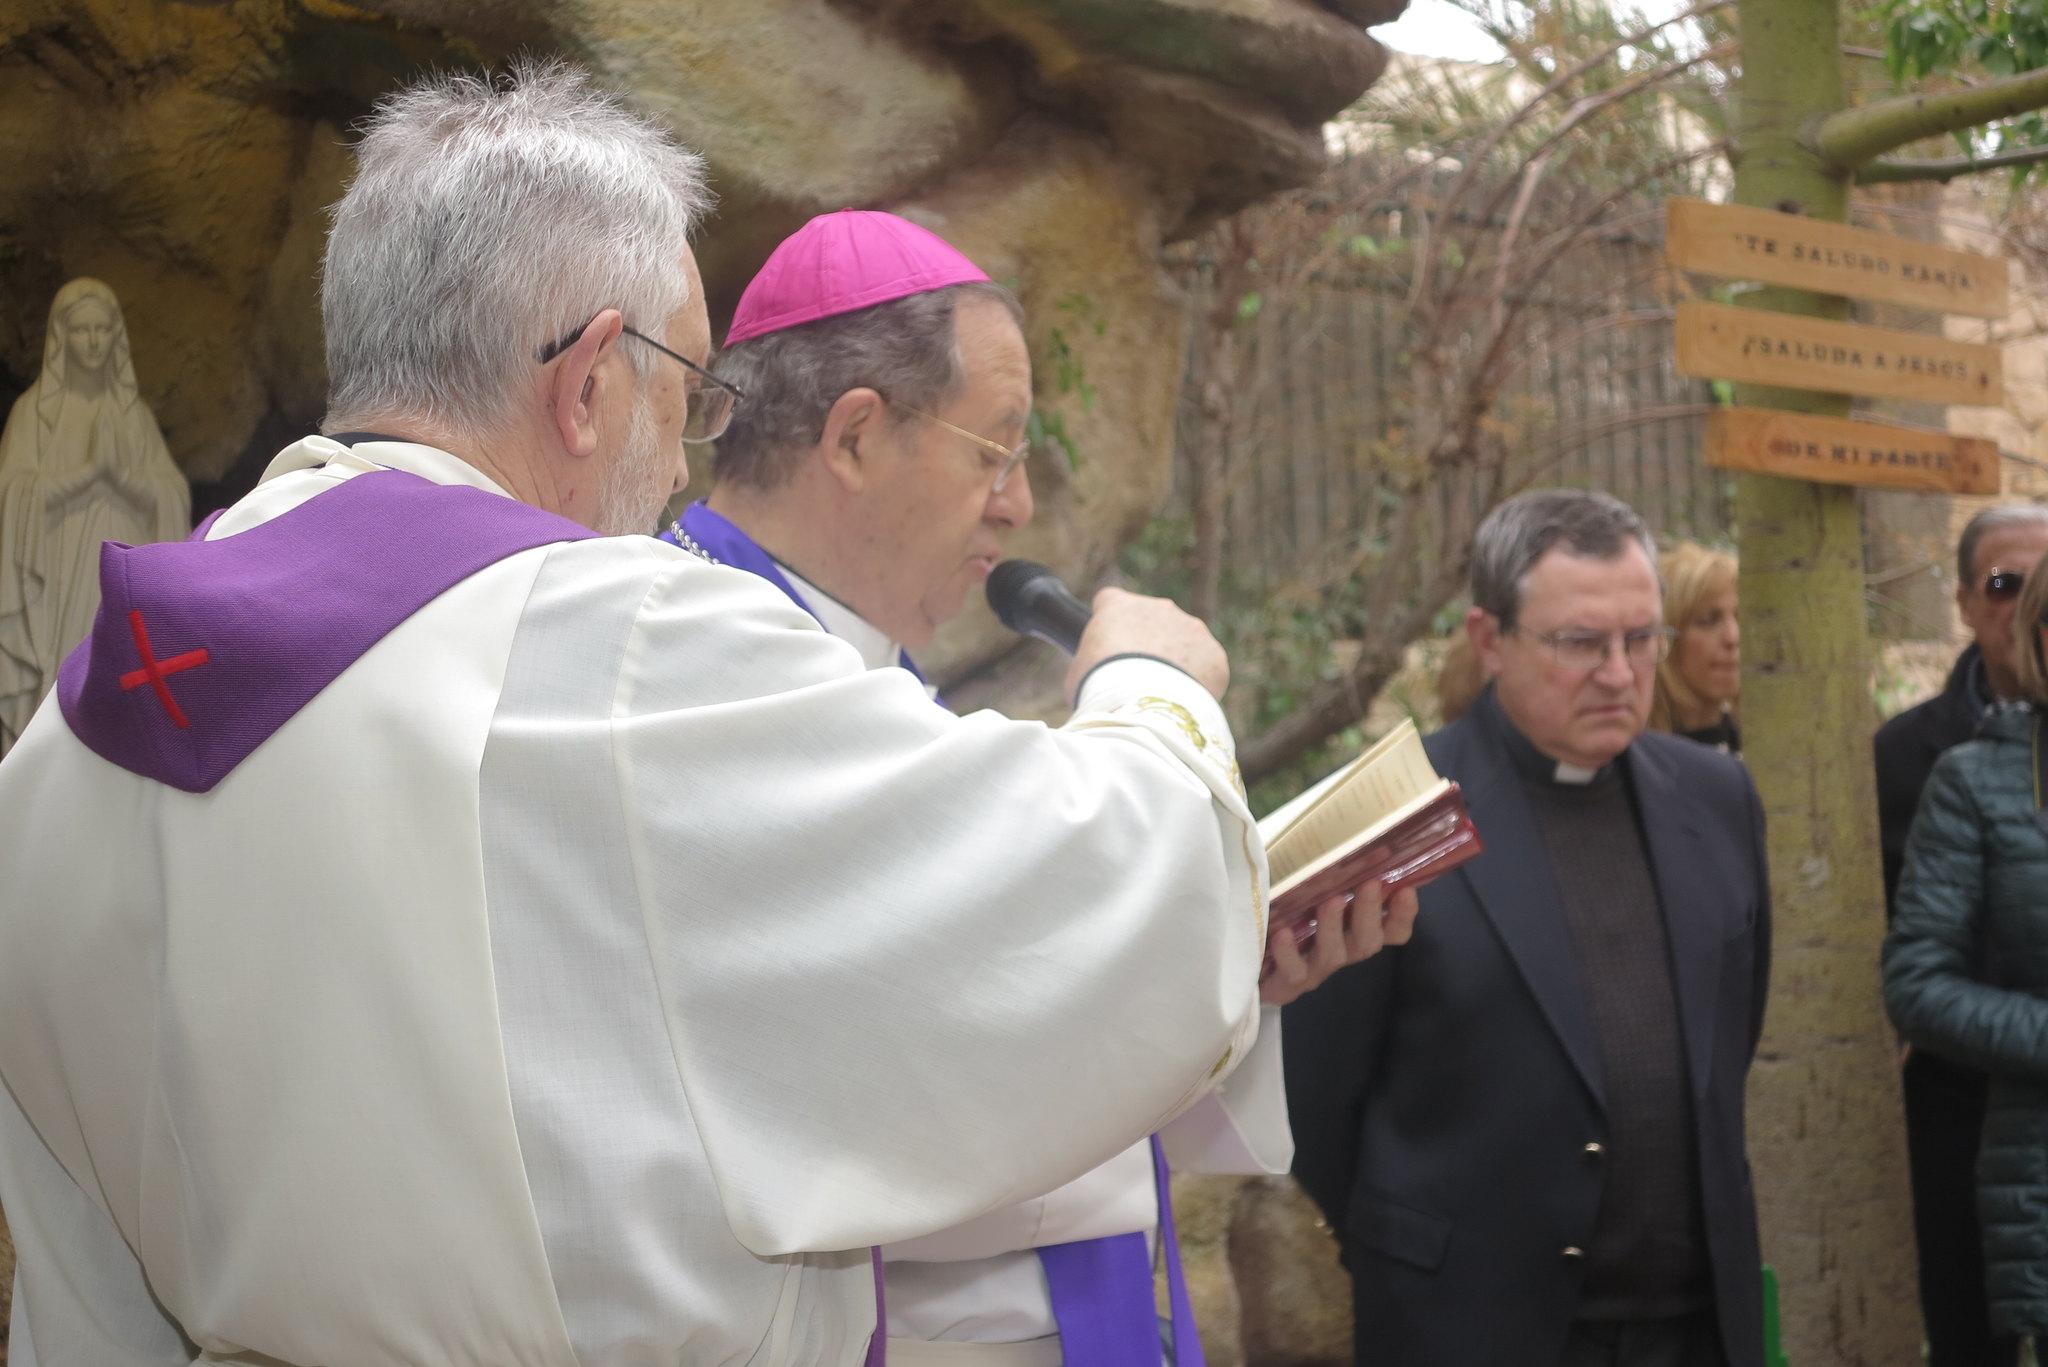 (2016-02-13) - Inauguración Virgen de Lourdes, La Molineta - Archivo La Molineta 2 (51)